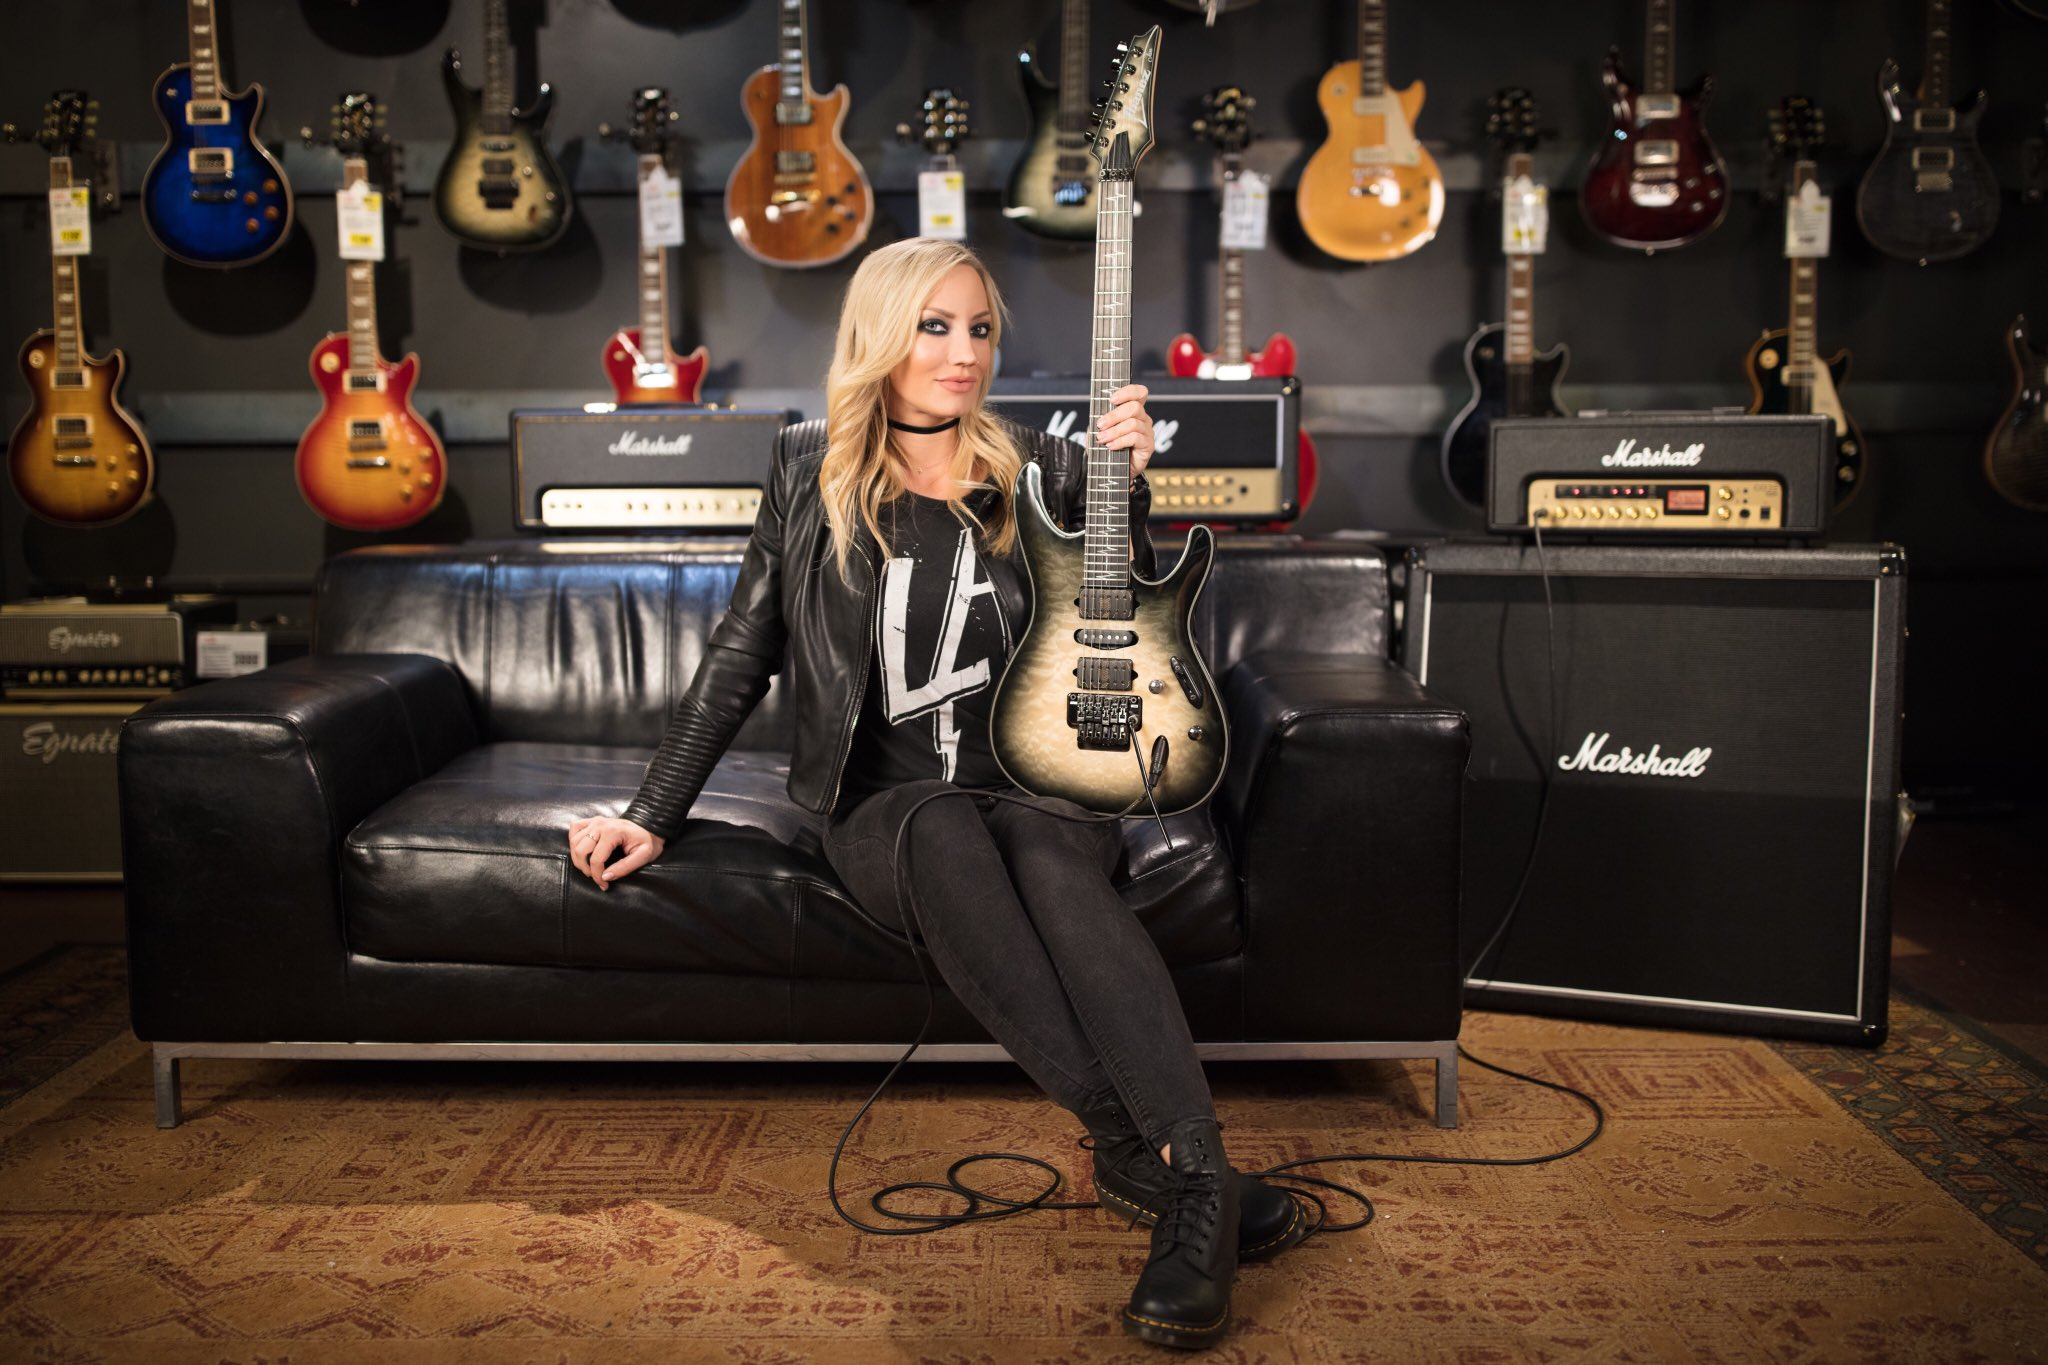 People 2048x1365 Nita Strauss guitar blonde makeup musical instrument women women indoors metalheads Marshall